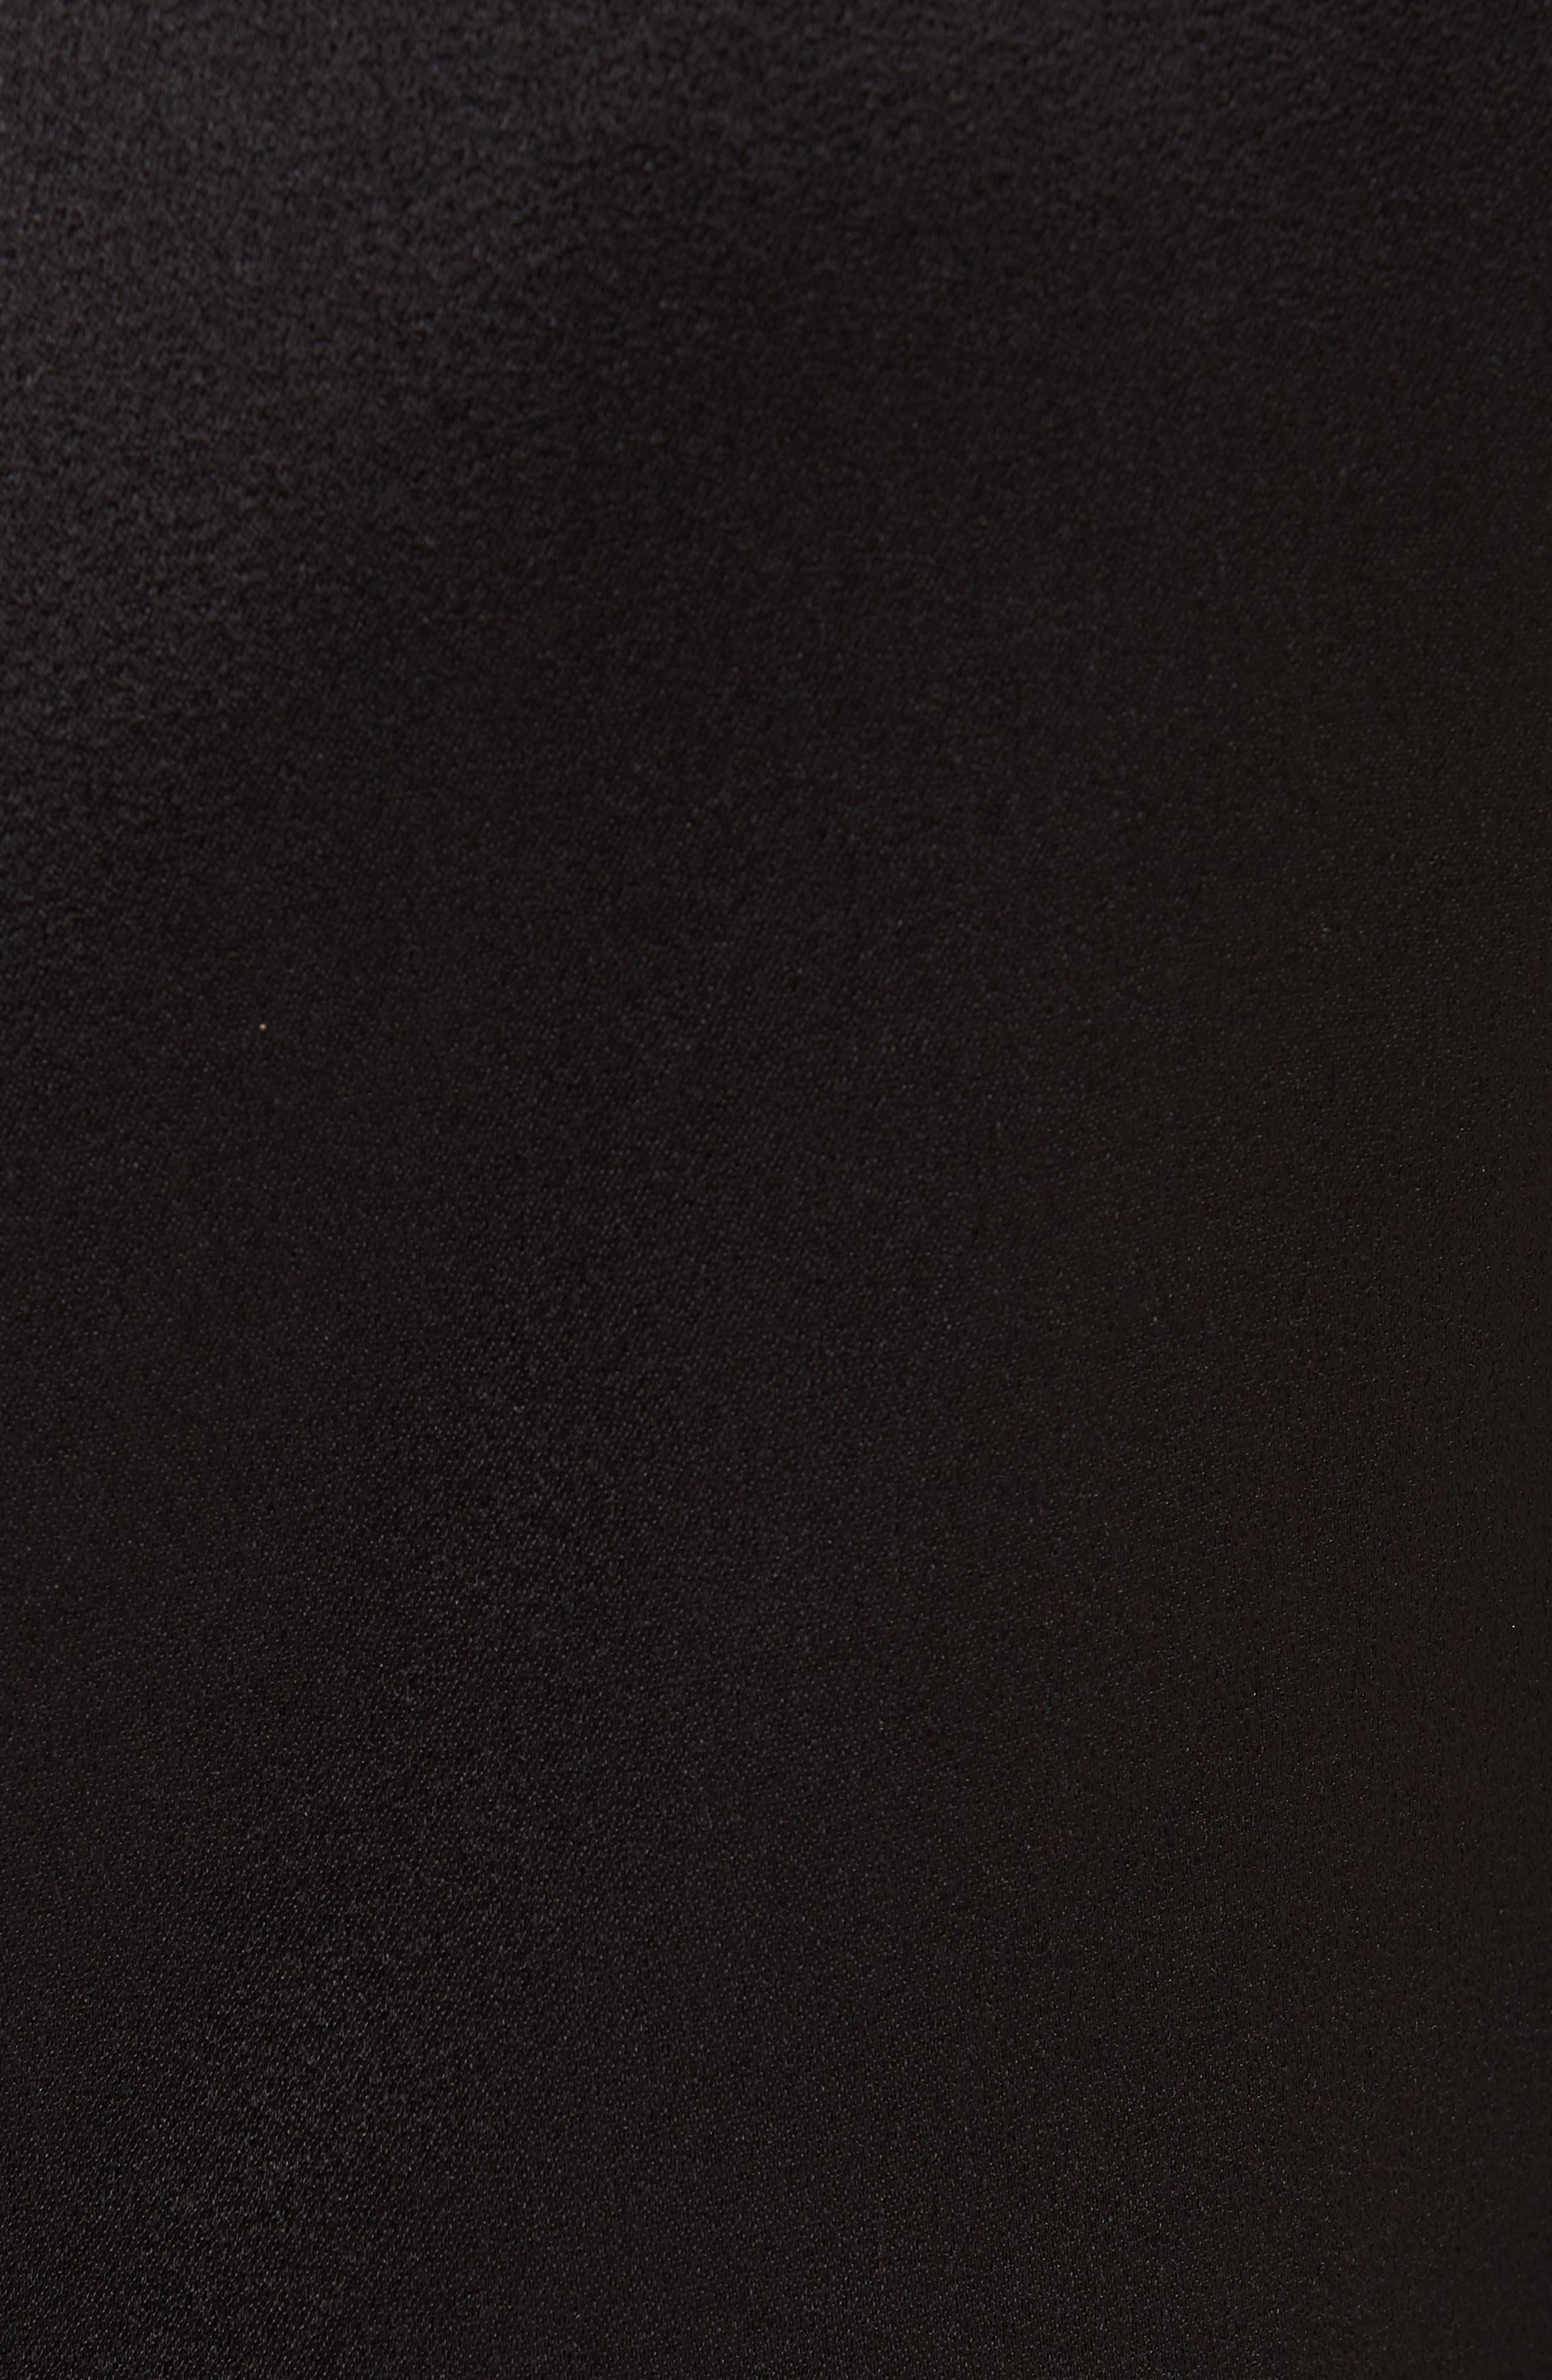 ALICE + OLIVIA,                             Coley A-Line Shift Dress,                             Alternate thumbnail 6, color,                             BLACK